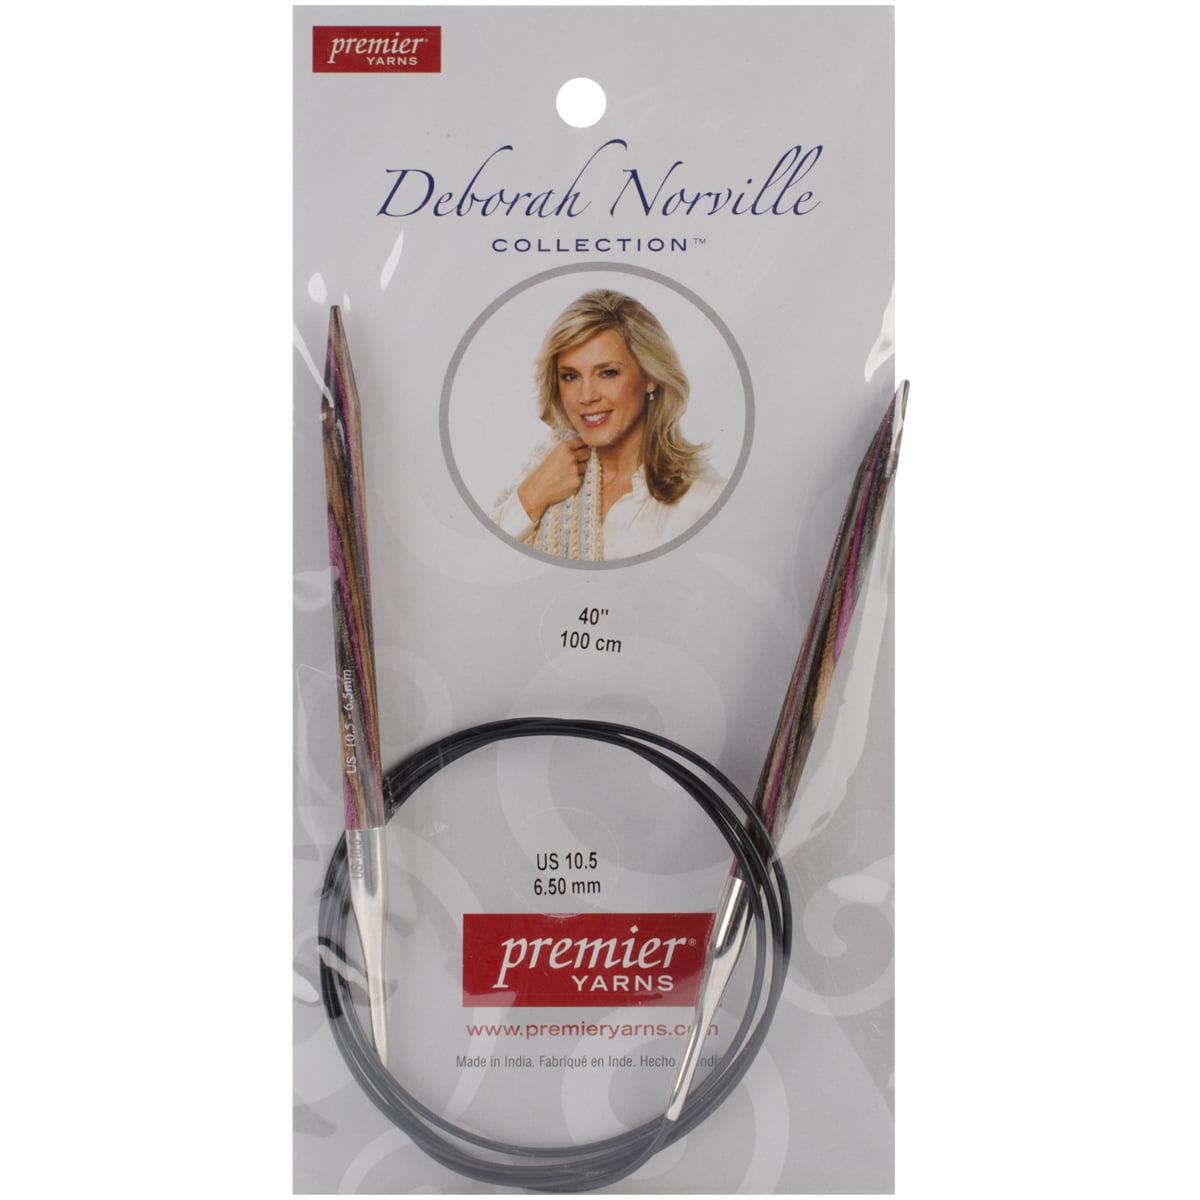 Premier Yarns Deborah Norville Fixed Circular Needles, 40-Inch, 10.5/6.5mm Multi-Colored